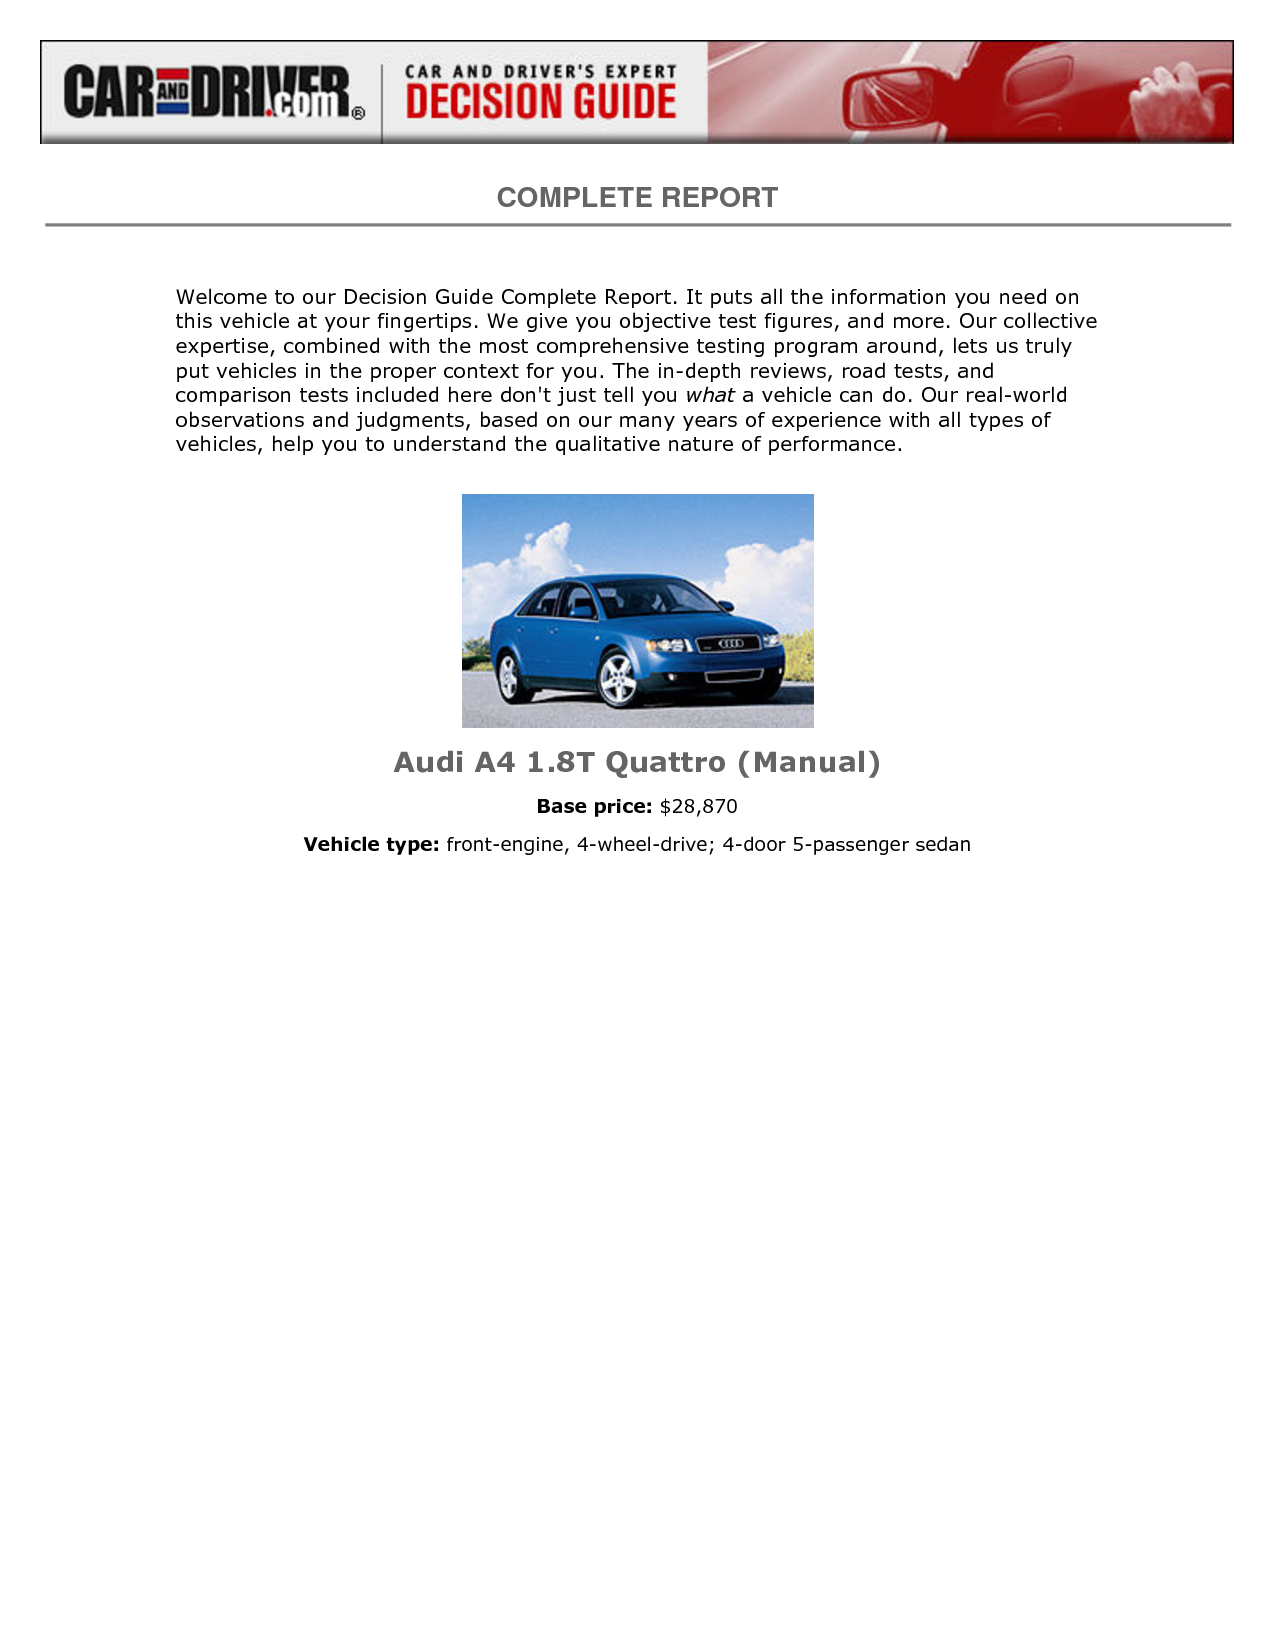 Audi A4 1.8 T 190hp quattro MT